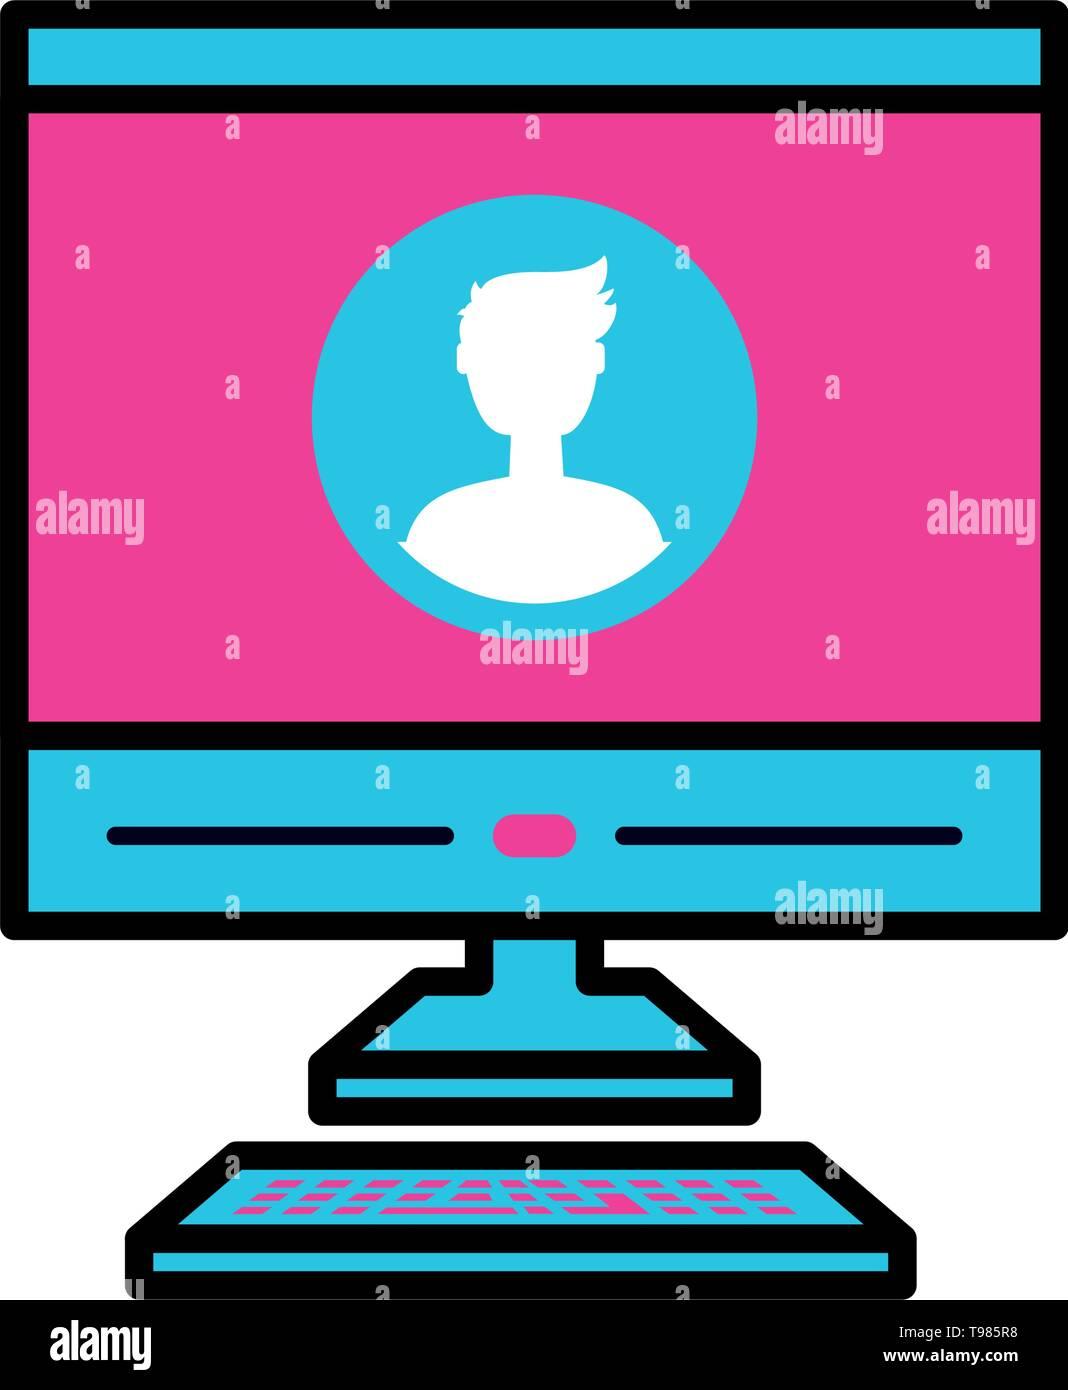 desktop computer device icon vector illustration design - Stock Image